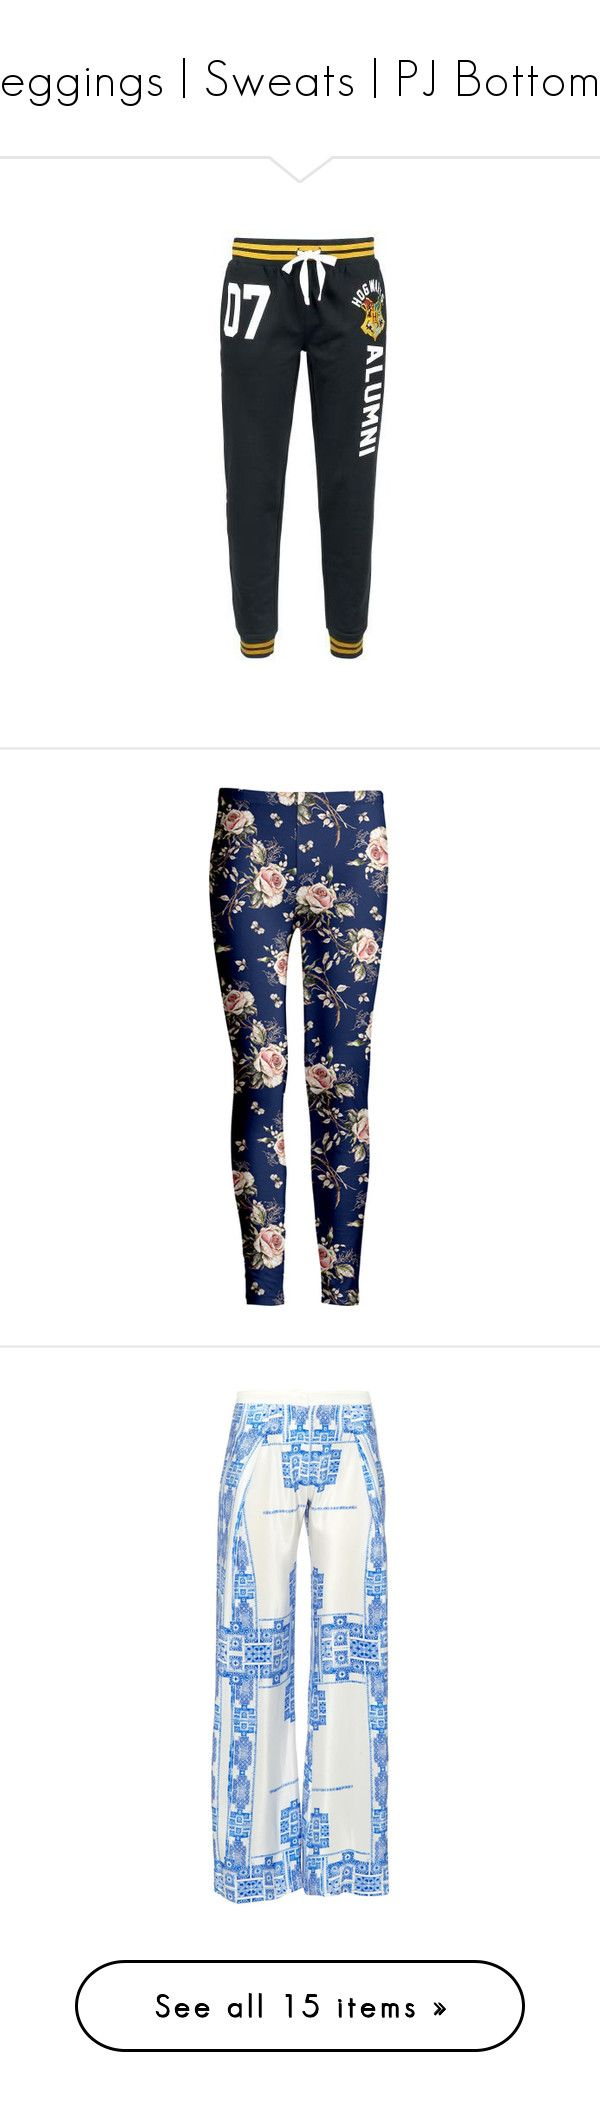 """Leggings | Sweats | PJ Bottoms"" by cupkatyk ❤ liked on Polyvore featuring plus size women's fashion, plus size clothing, plus size pants, plus size leggings, stretch leggings, pink leggings, patterned leggings, floral leggings, floral print pants and activewear"